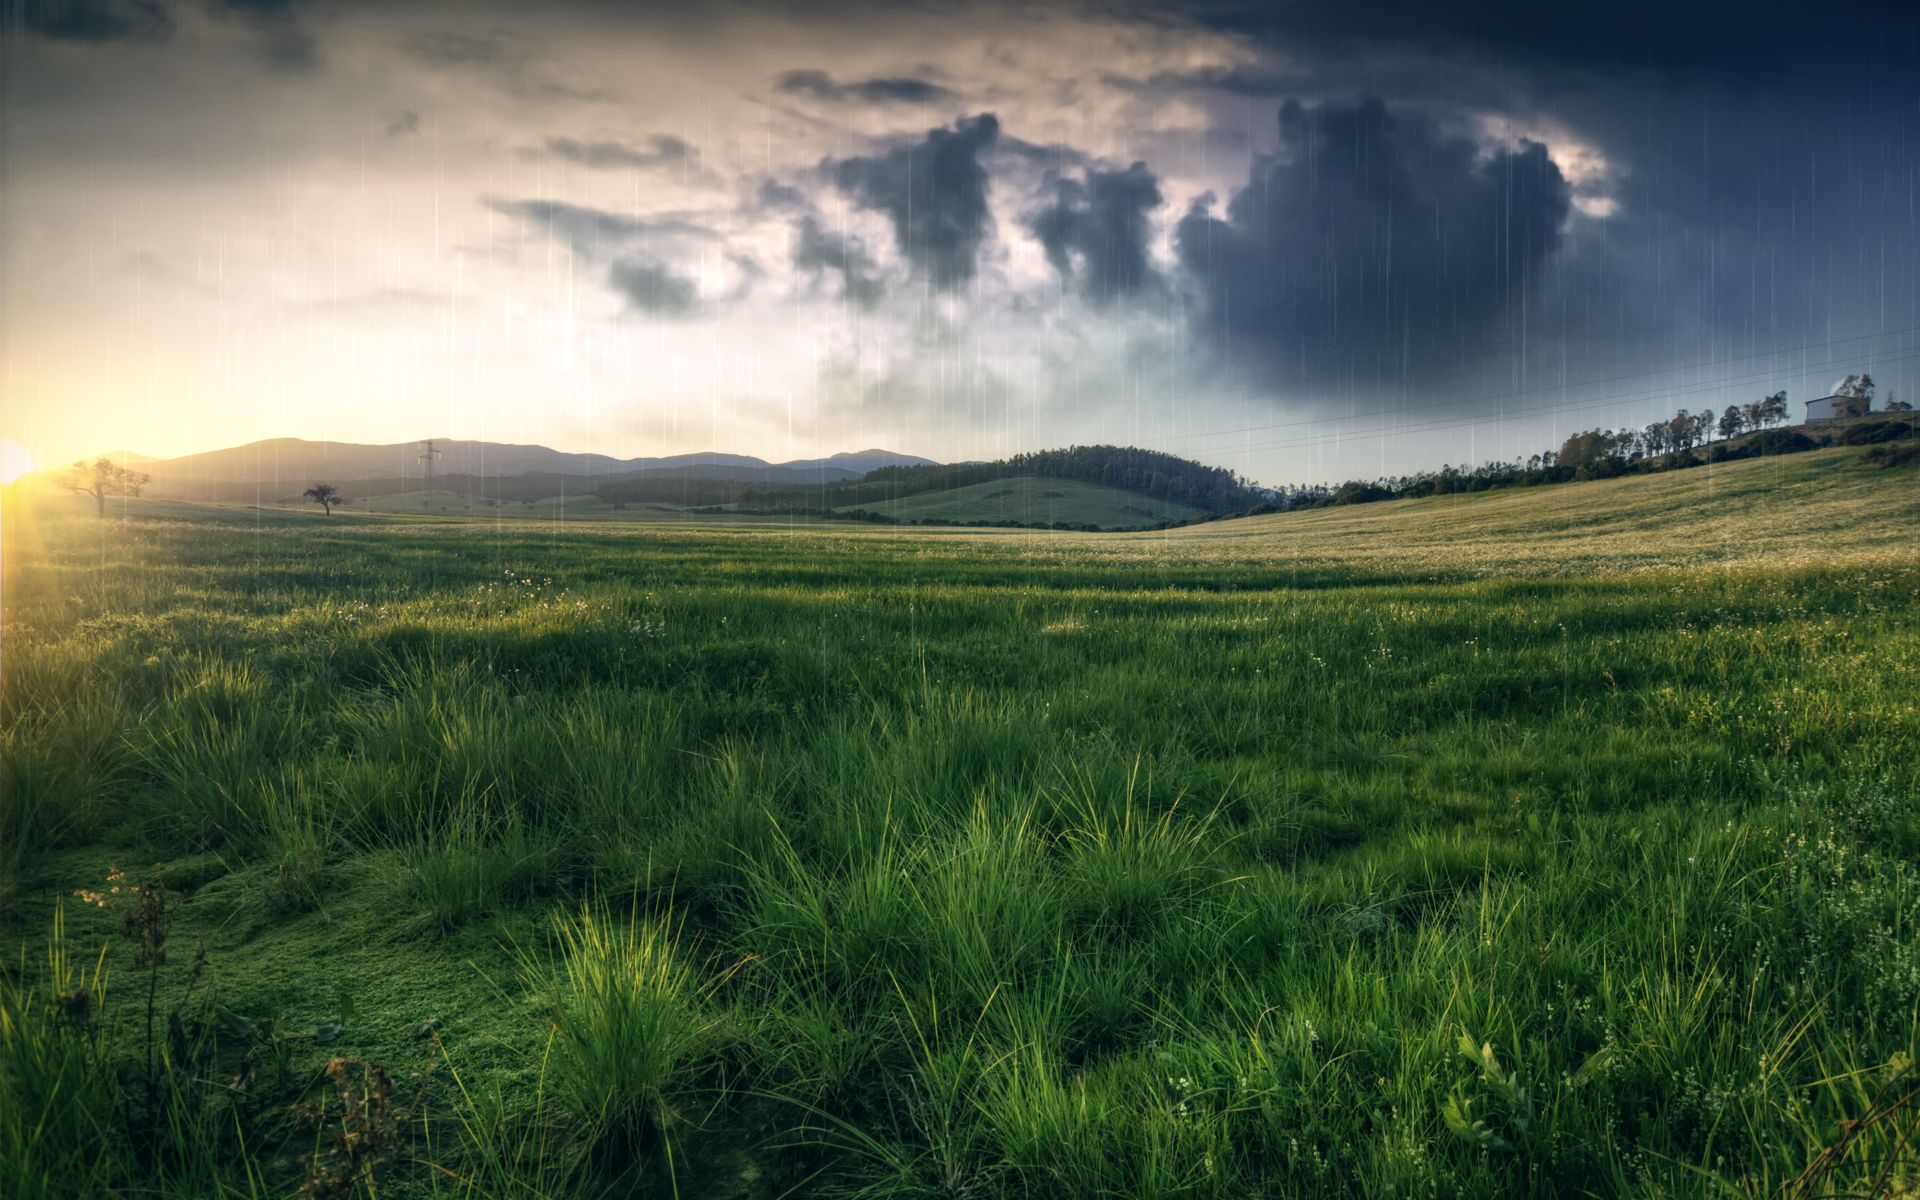 pin nature wallpaper landscape - photo #22